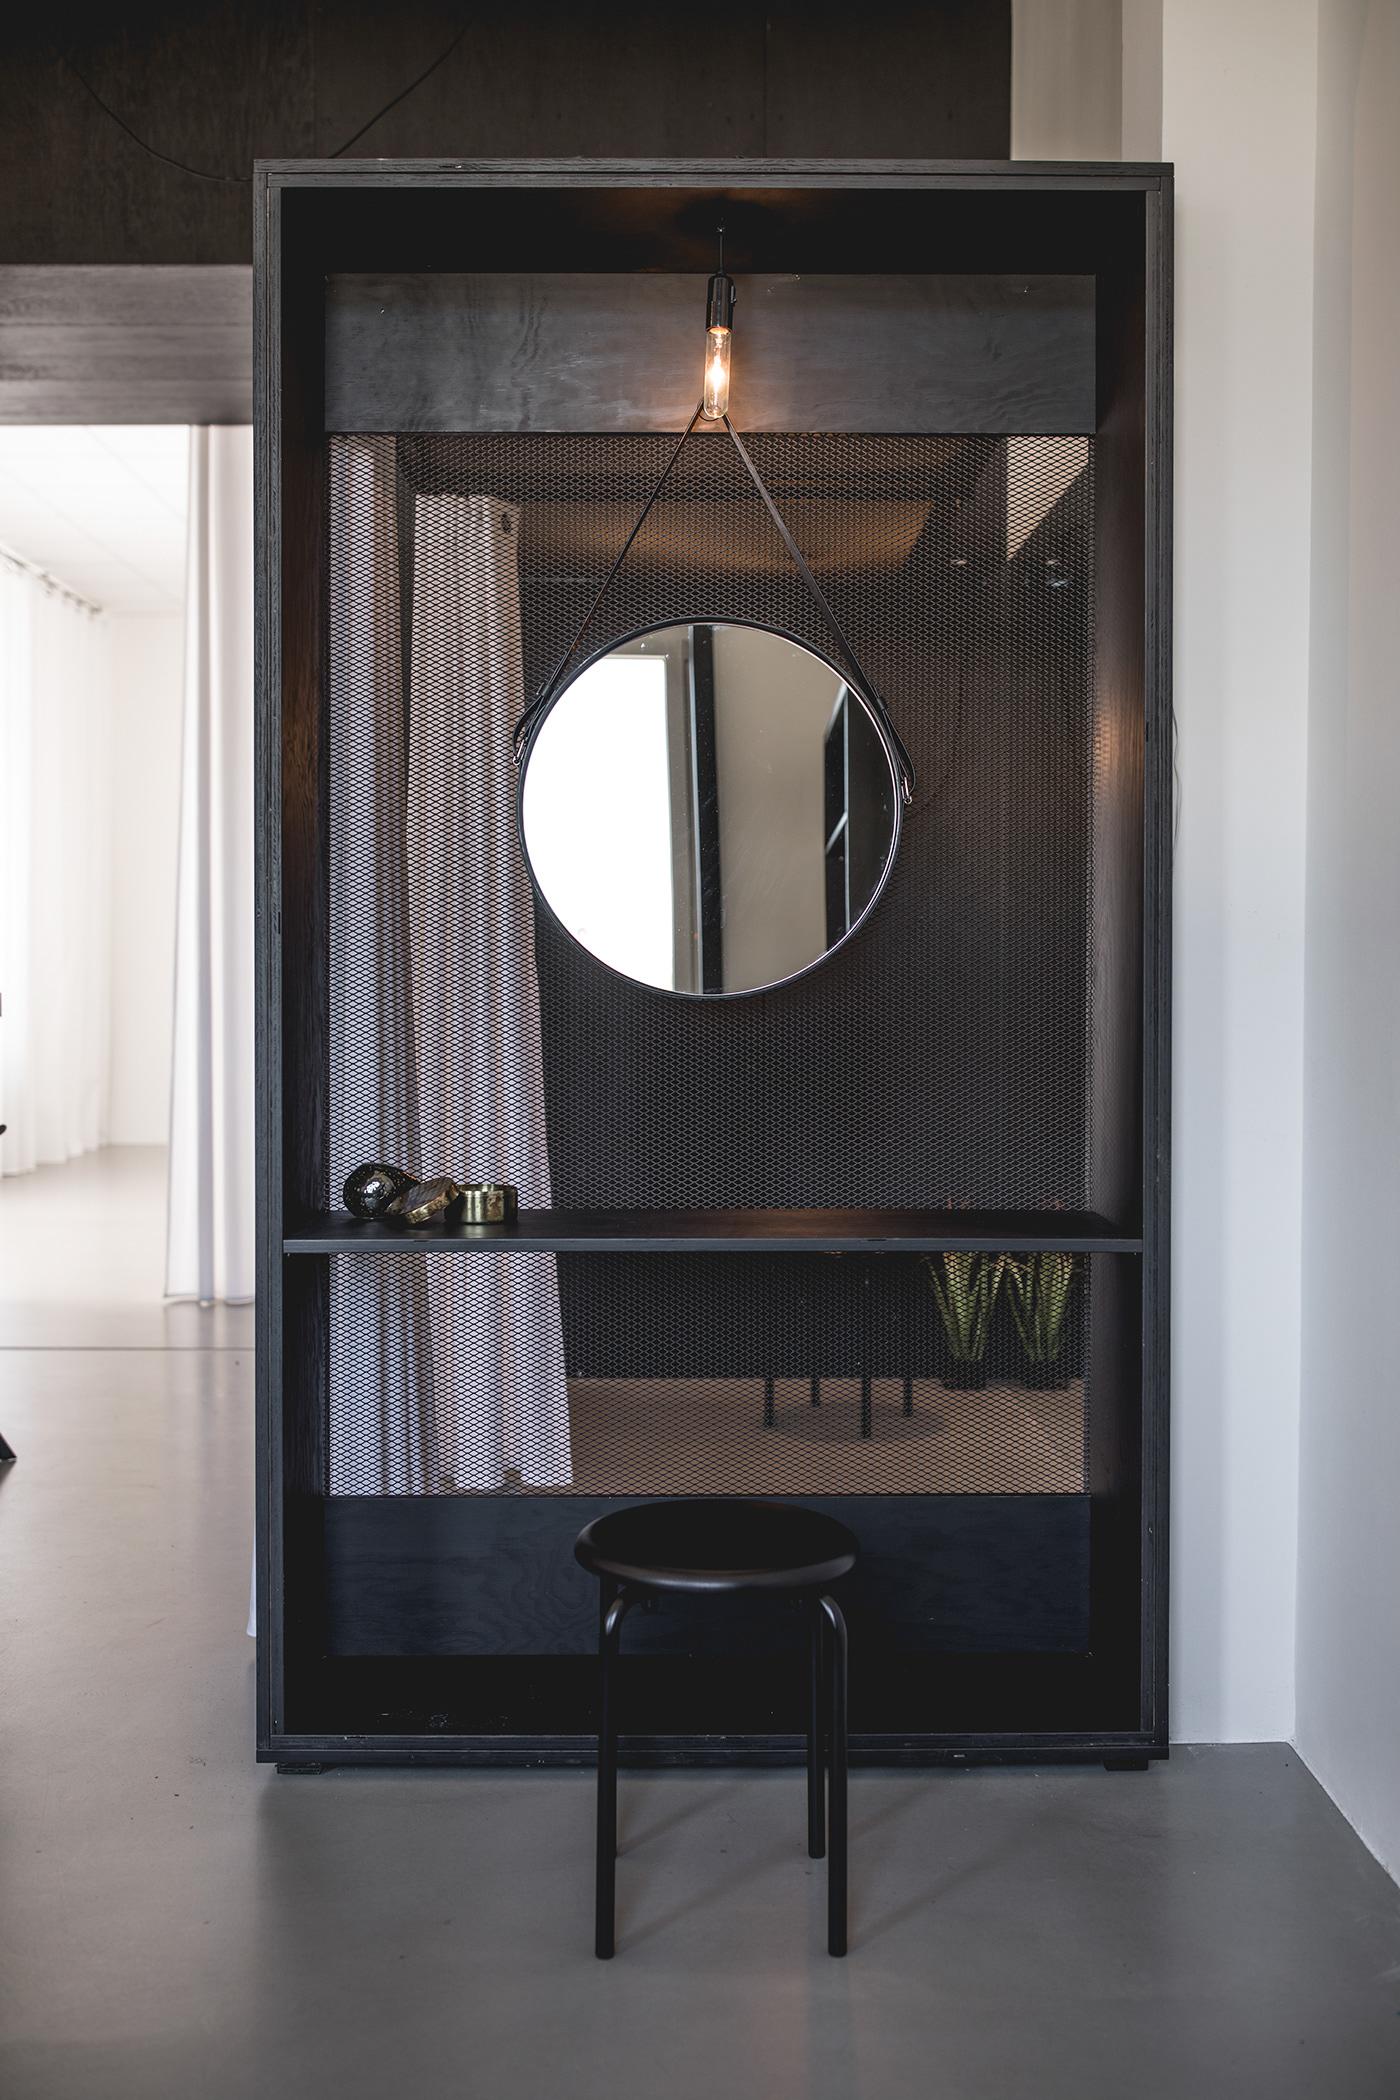 architecture brand branddesign brandspace carpenter design furniture Interior manufacture studio